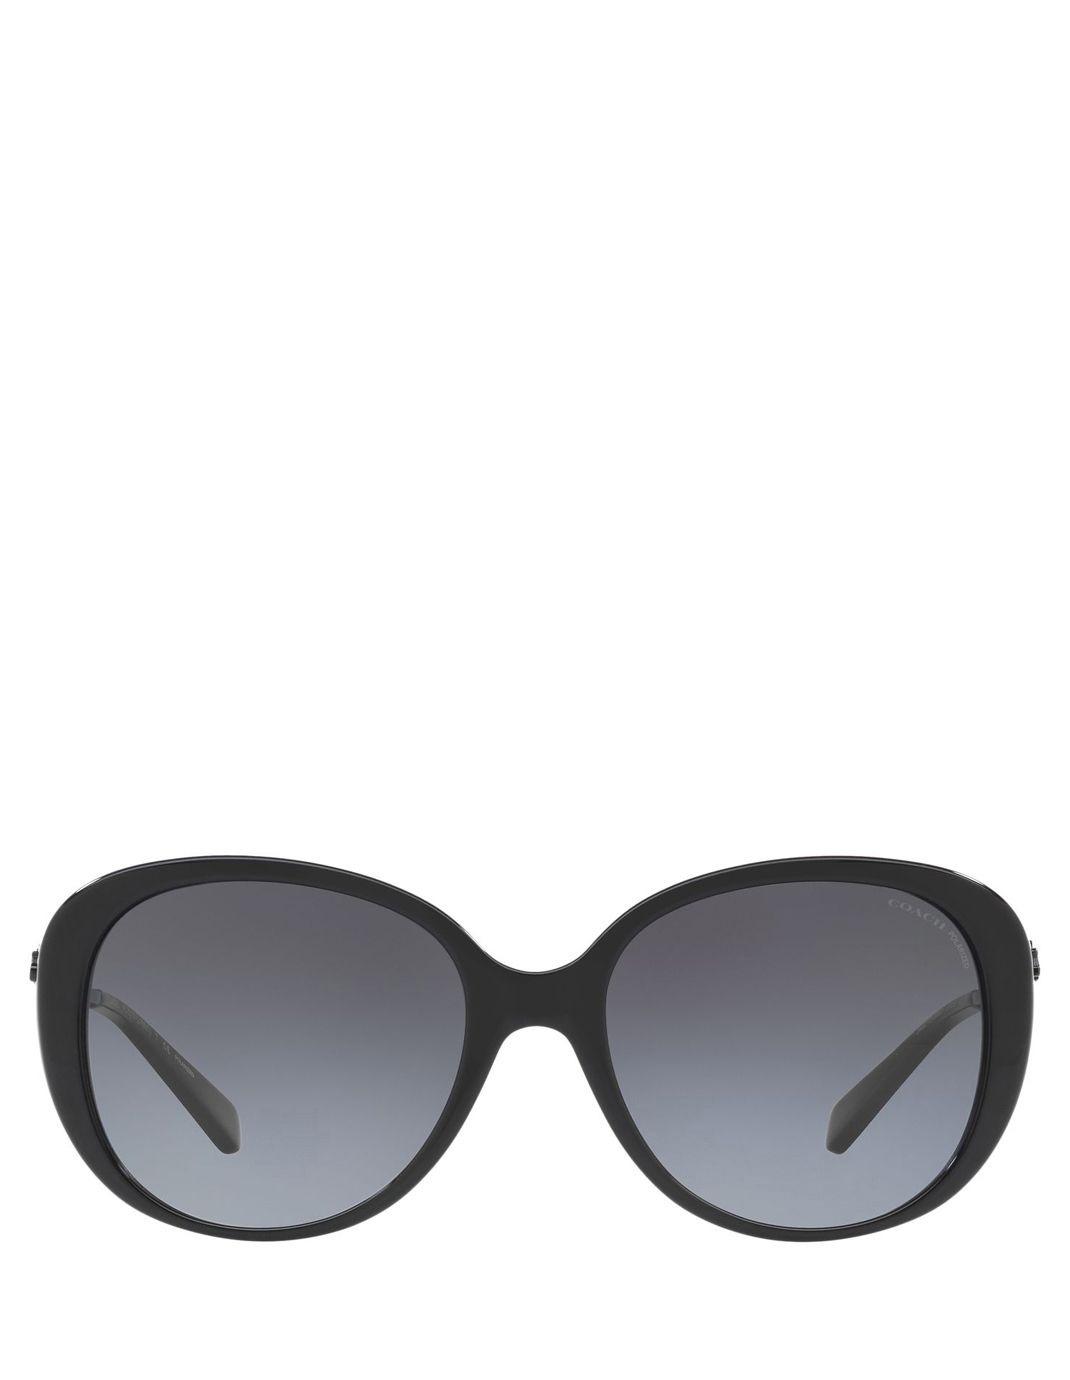 13d33bf6a2 ... switzerland coach hc8215 sunglasses myer online 1f34c 91ba2